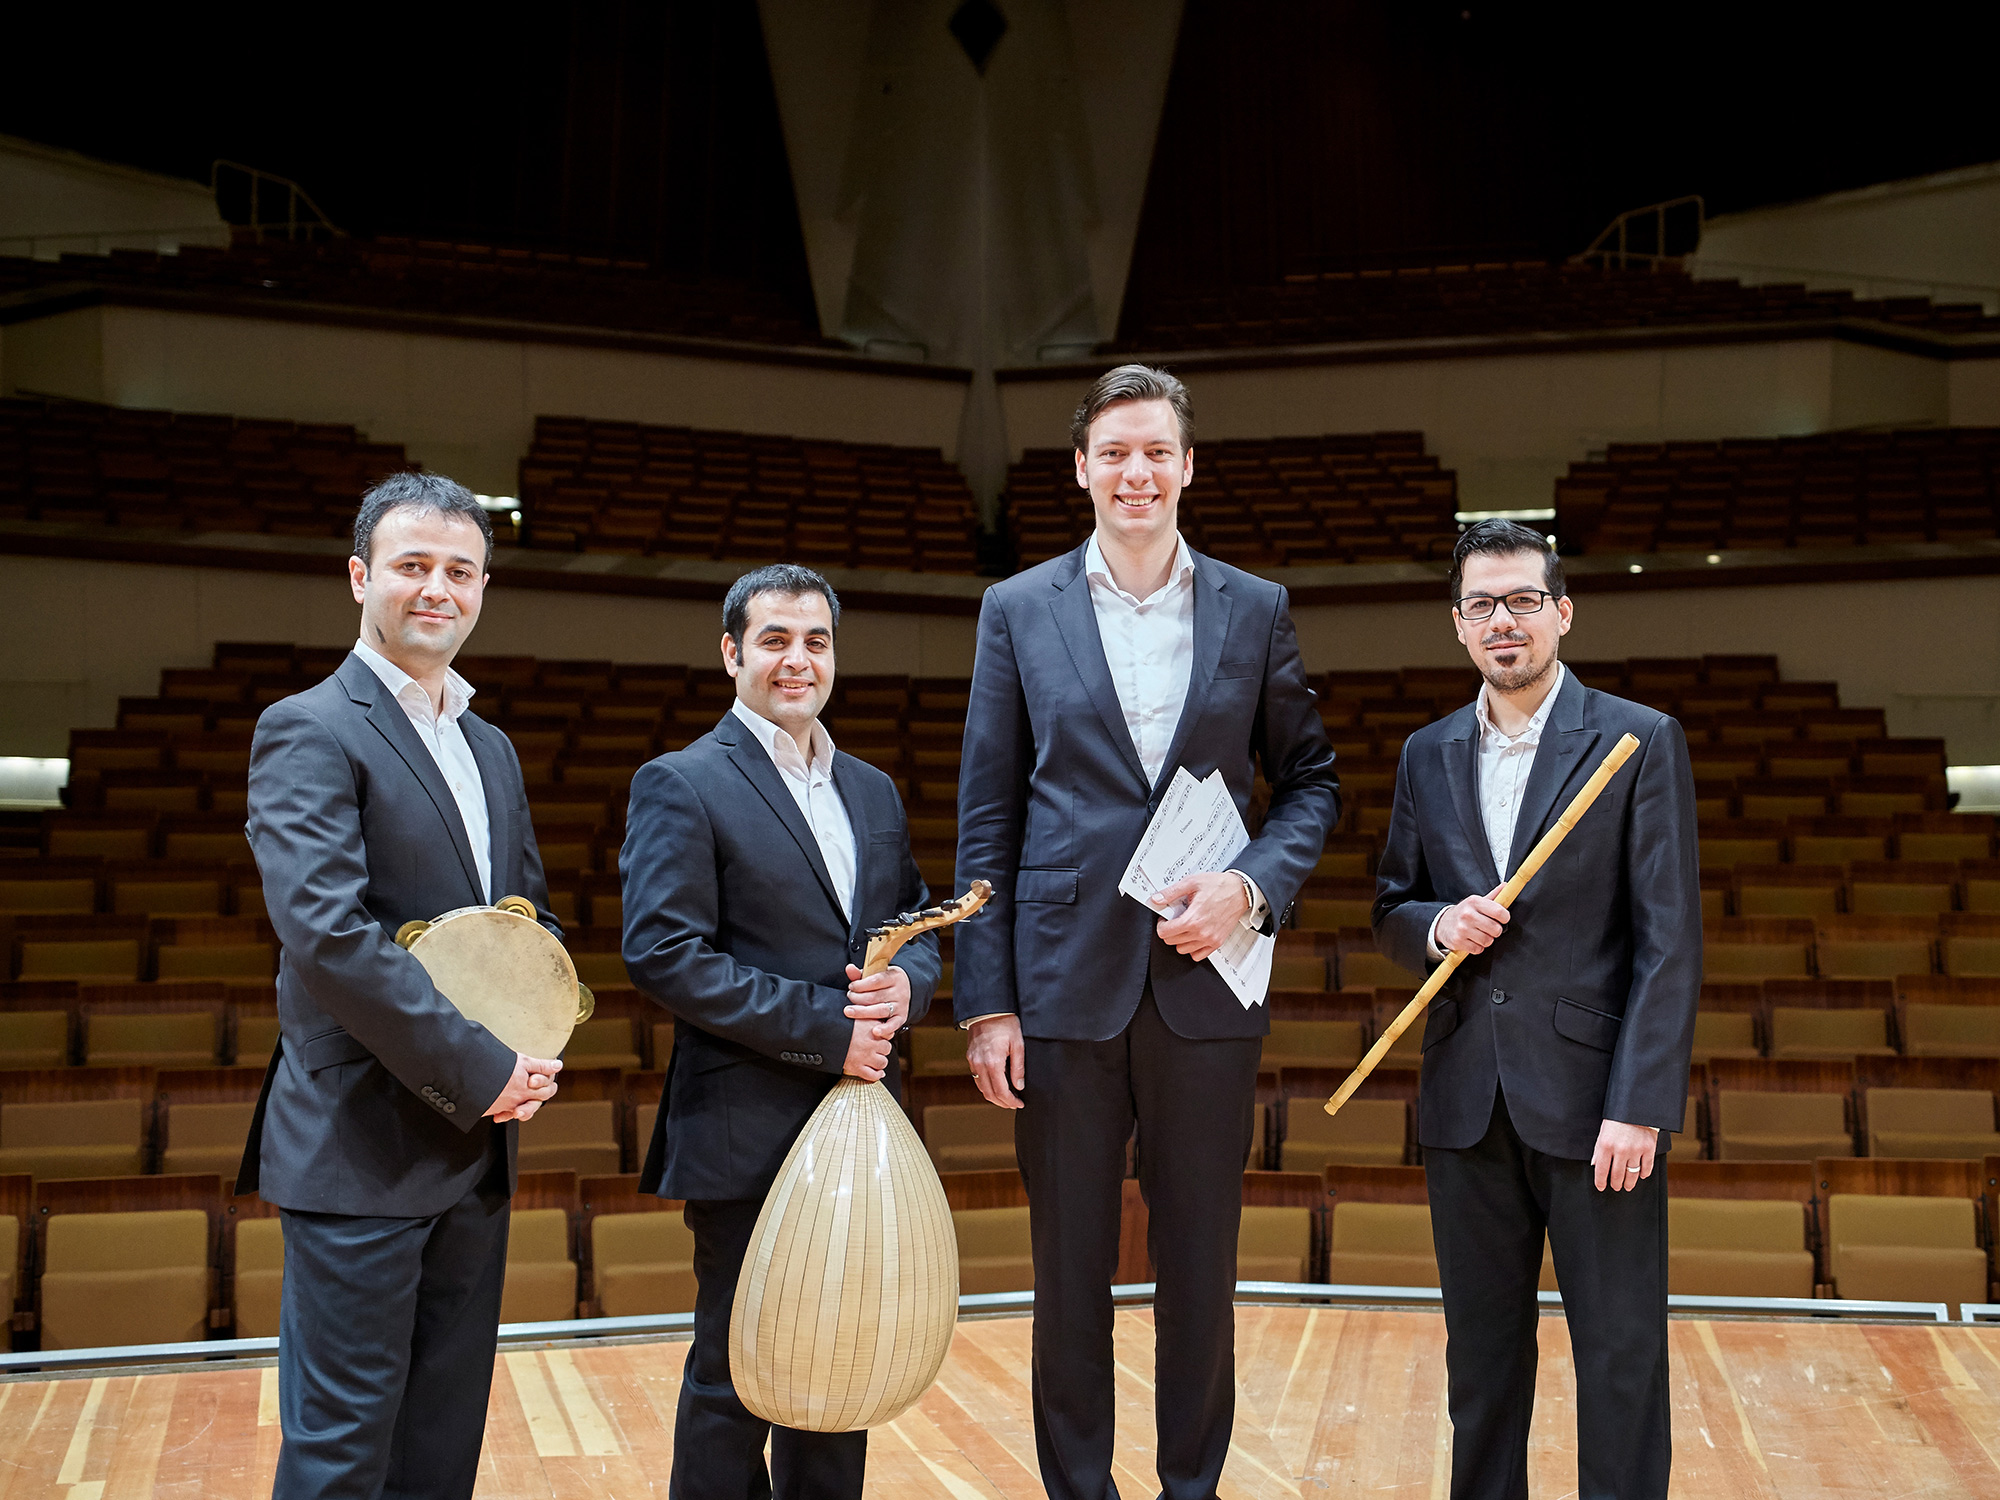 Solidaritätskonzert mit den Berliner Symphonikern